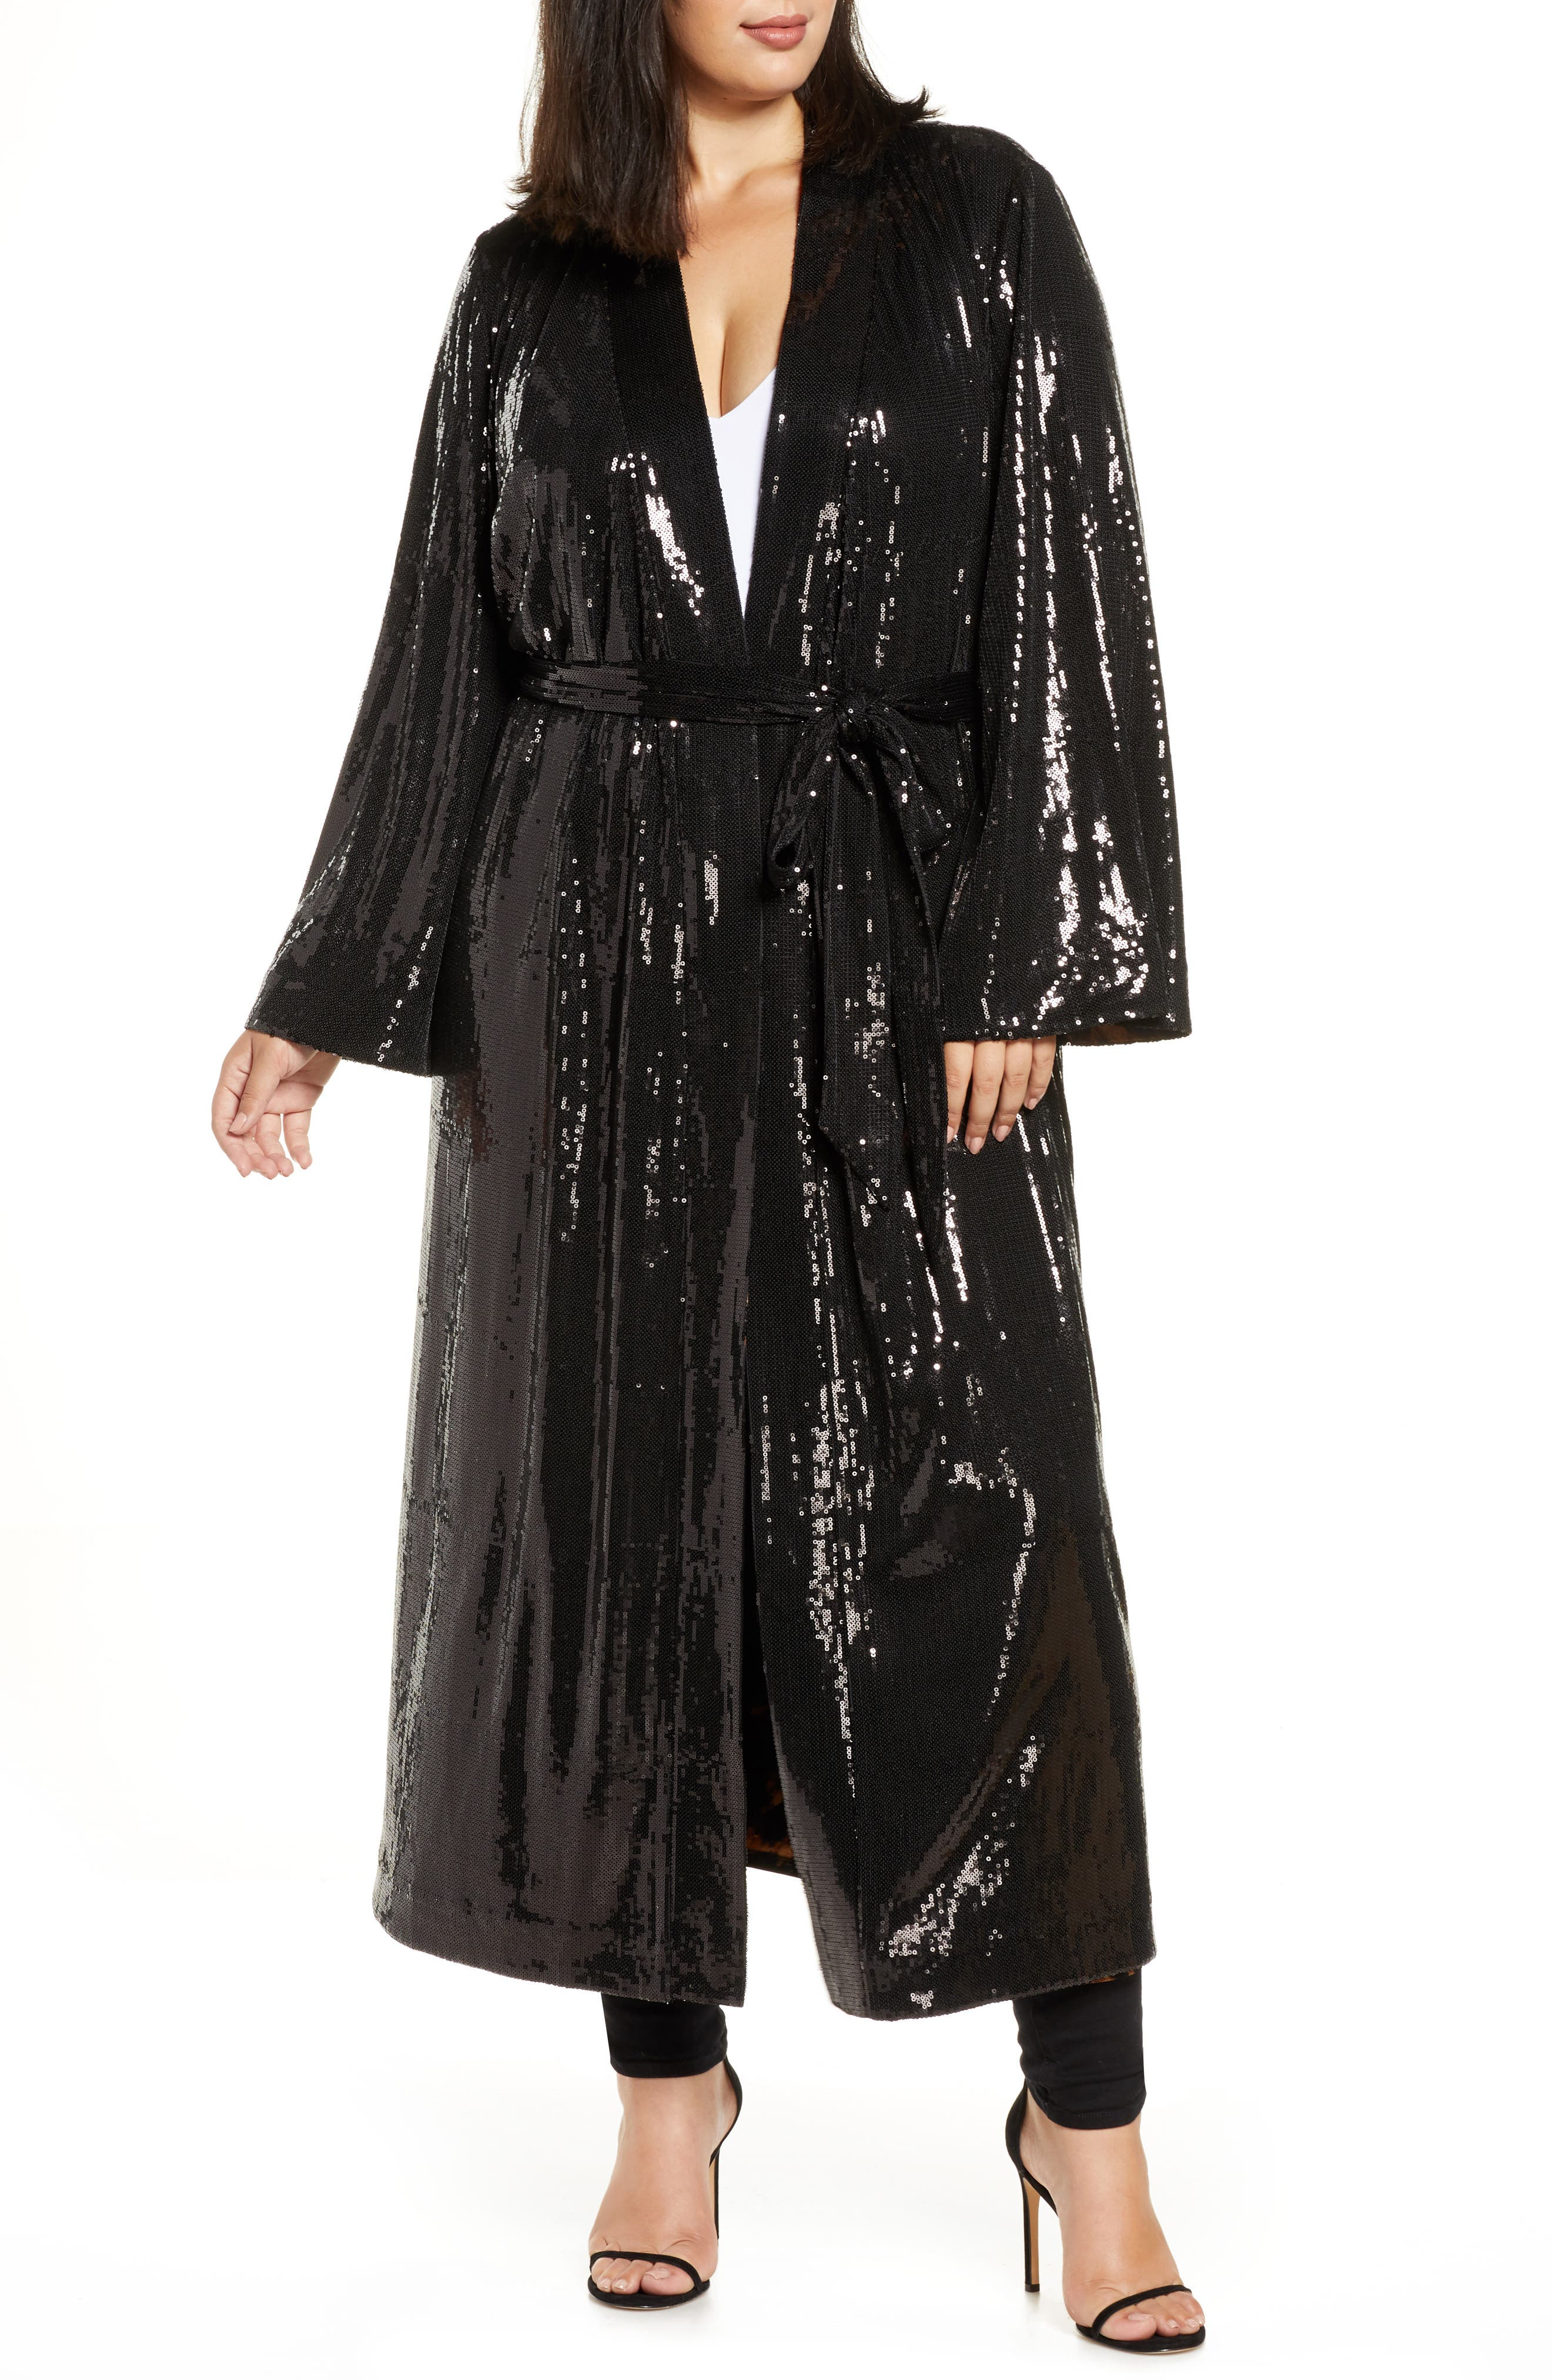 1920s Shawls, Wraps, Scarves, Fur Stole Plus Size Womens Coldesina Sequin Duster $298.00 AT vintagedancer.com